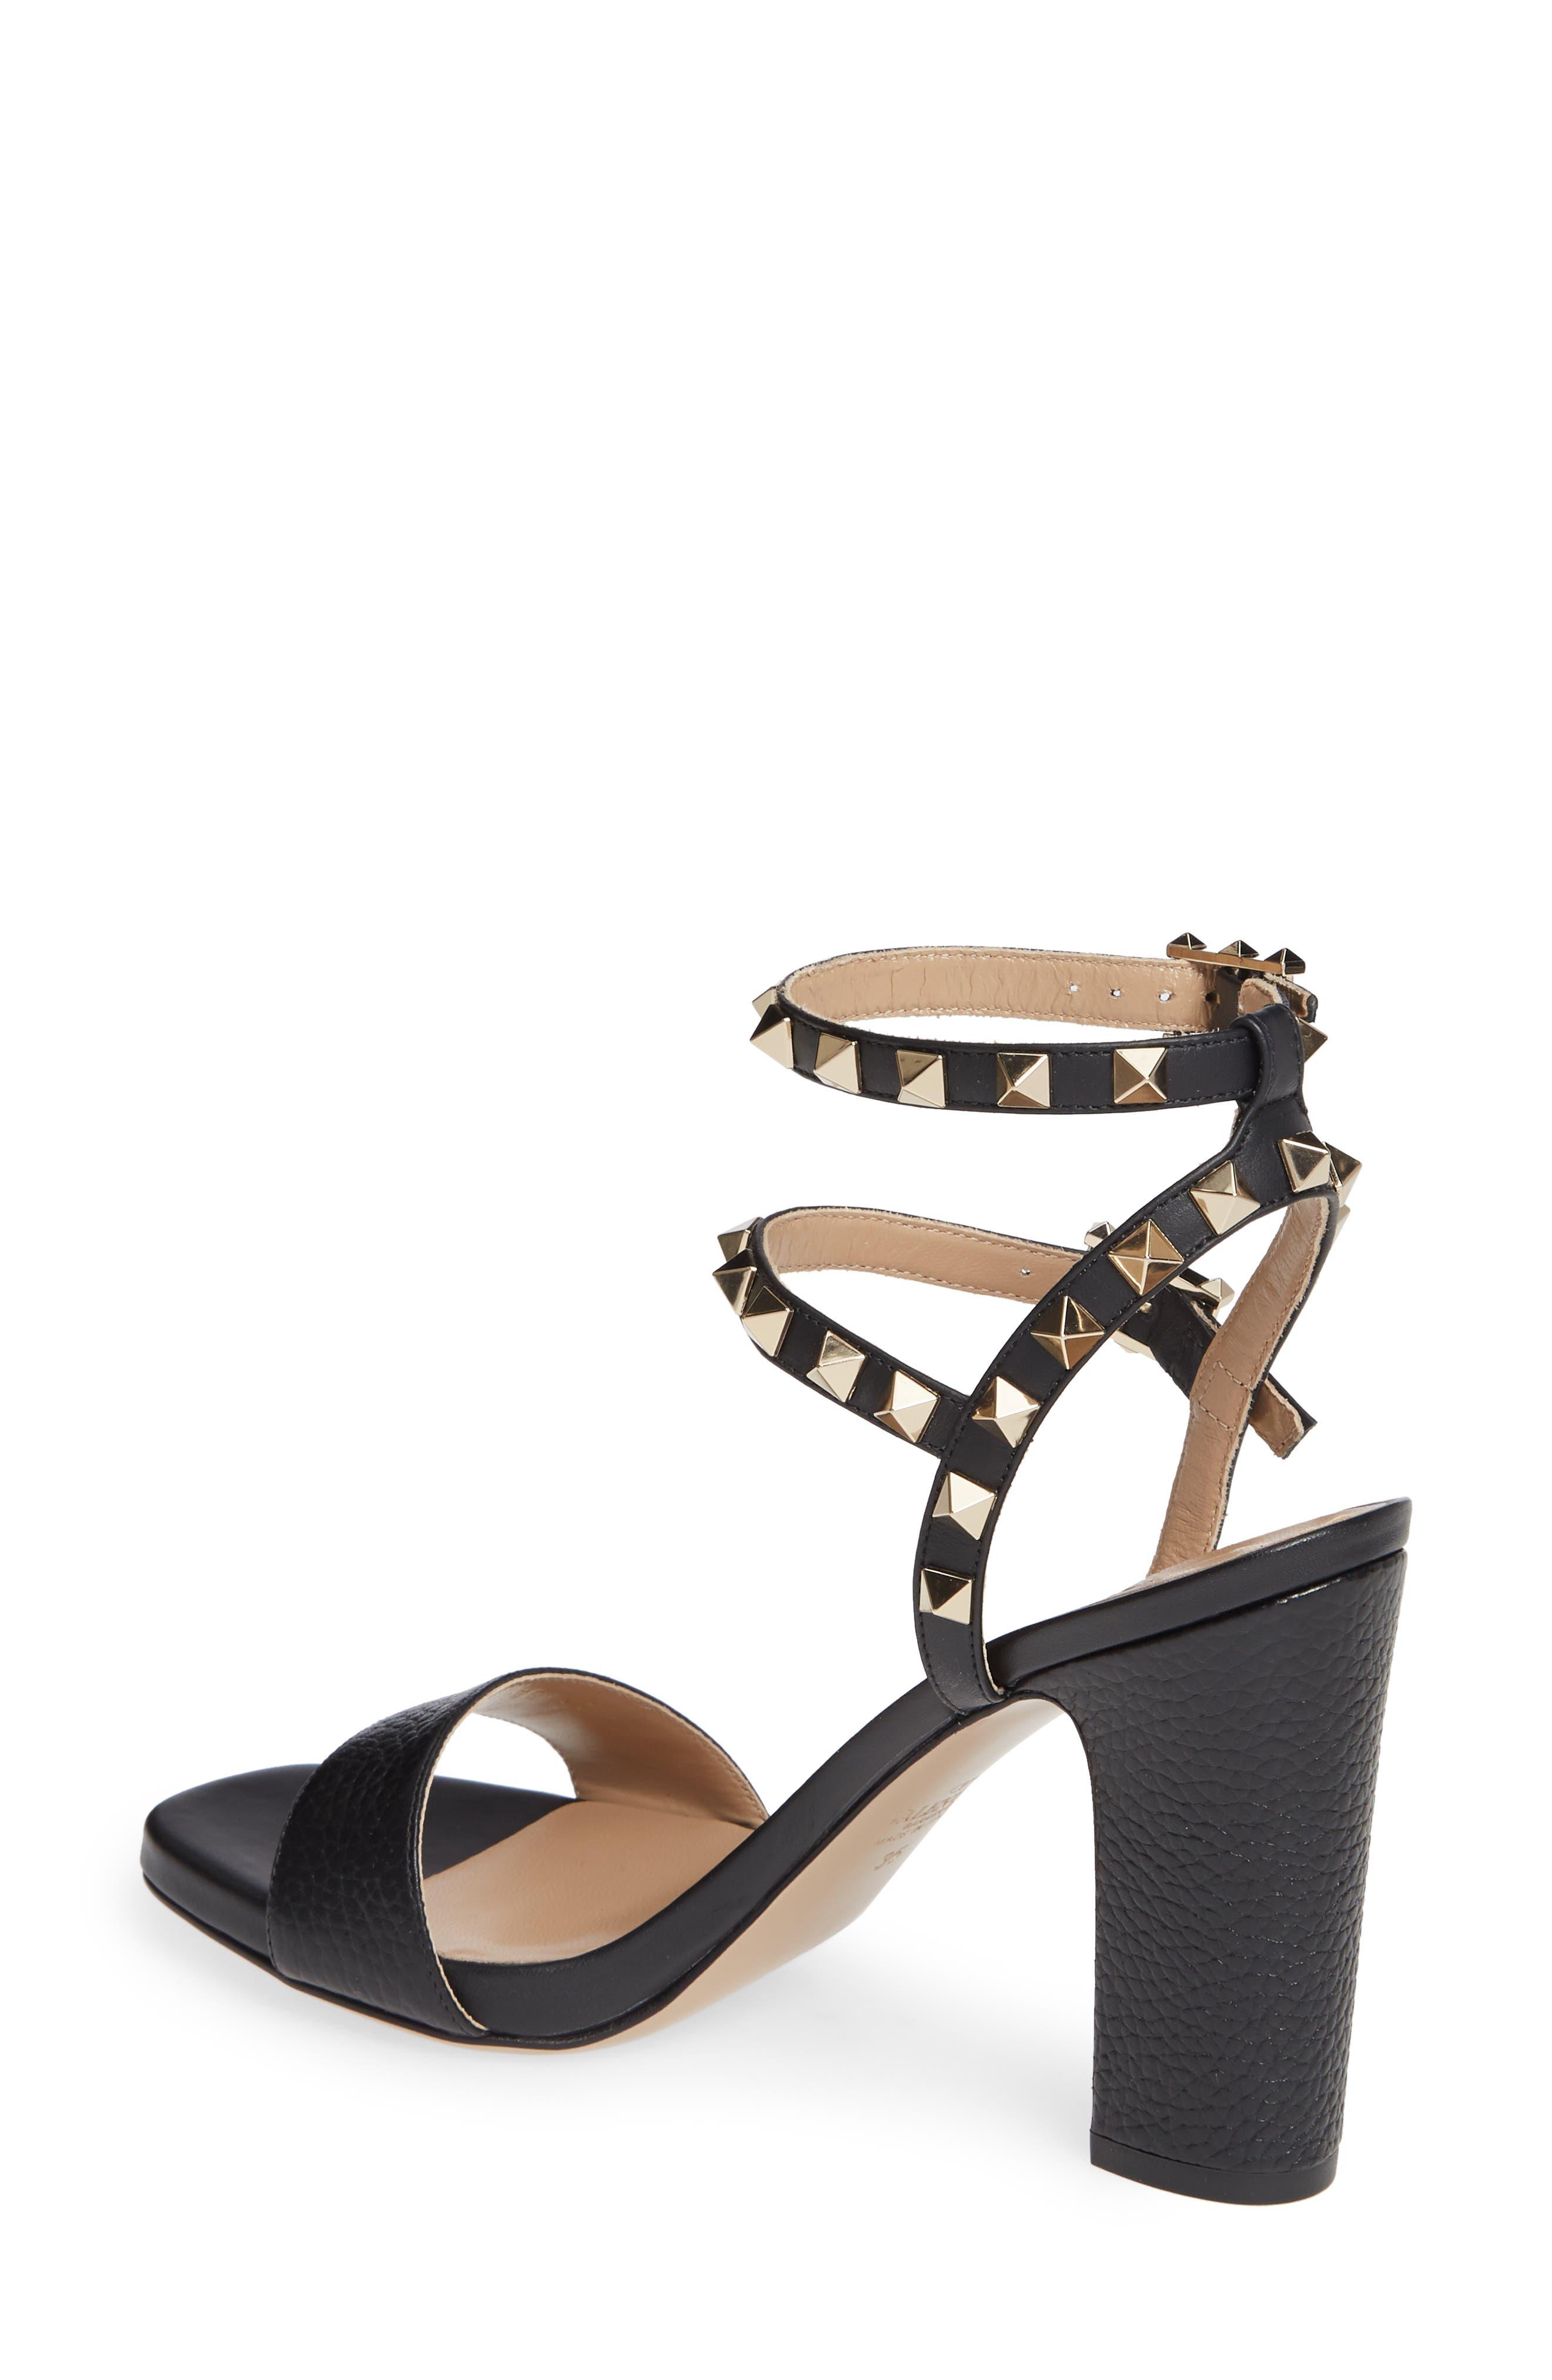 VALENTINO GARAVANI, Rockstud Ankle Strap Block Sandal, Alternate thumbnail 2, color, BLACK/ BLACK